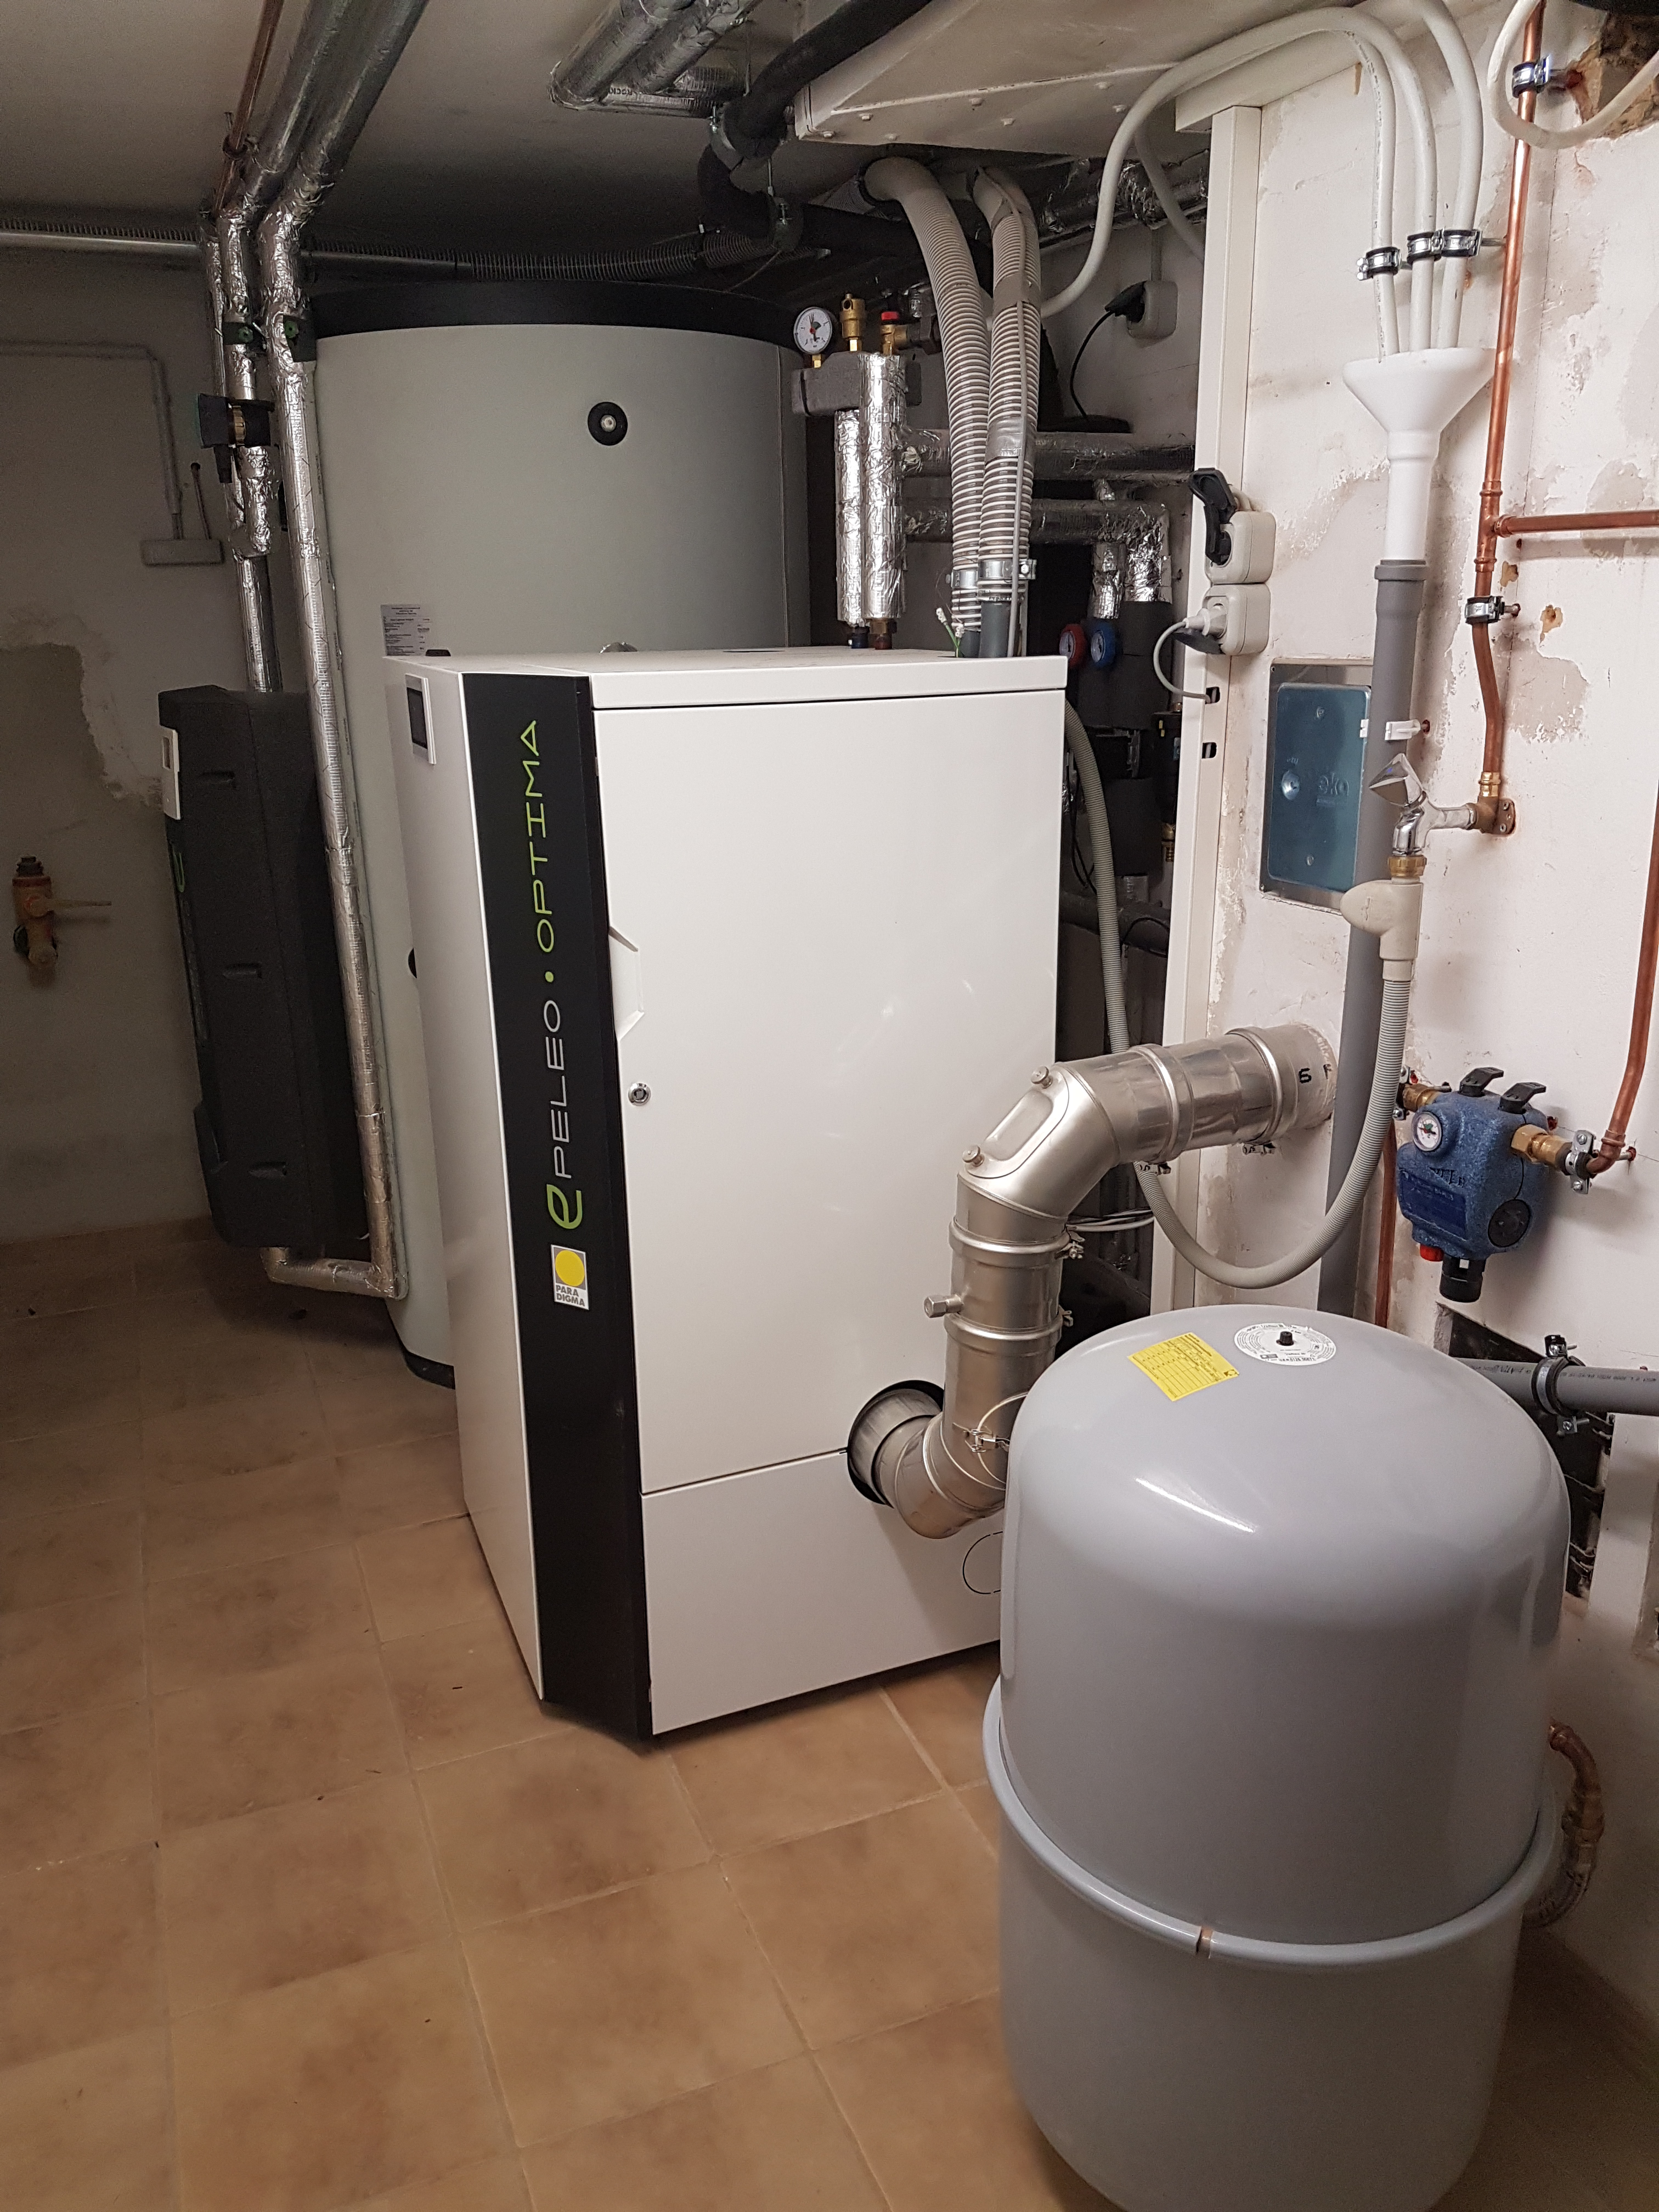 2. Projekt des Monats März 2018 Solarthermie Kassel Mehrfamilienhaus JungSolar